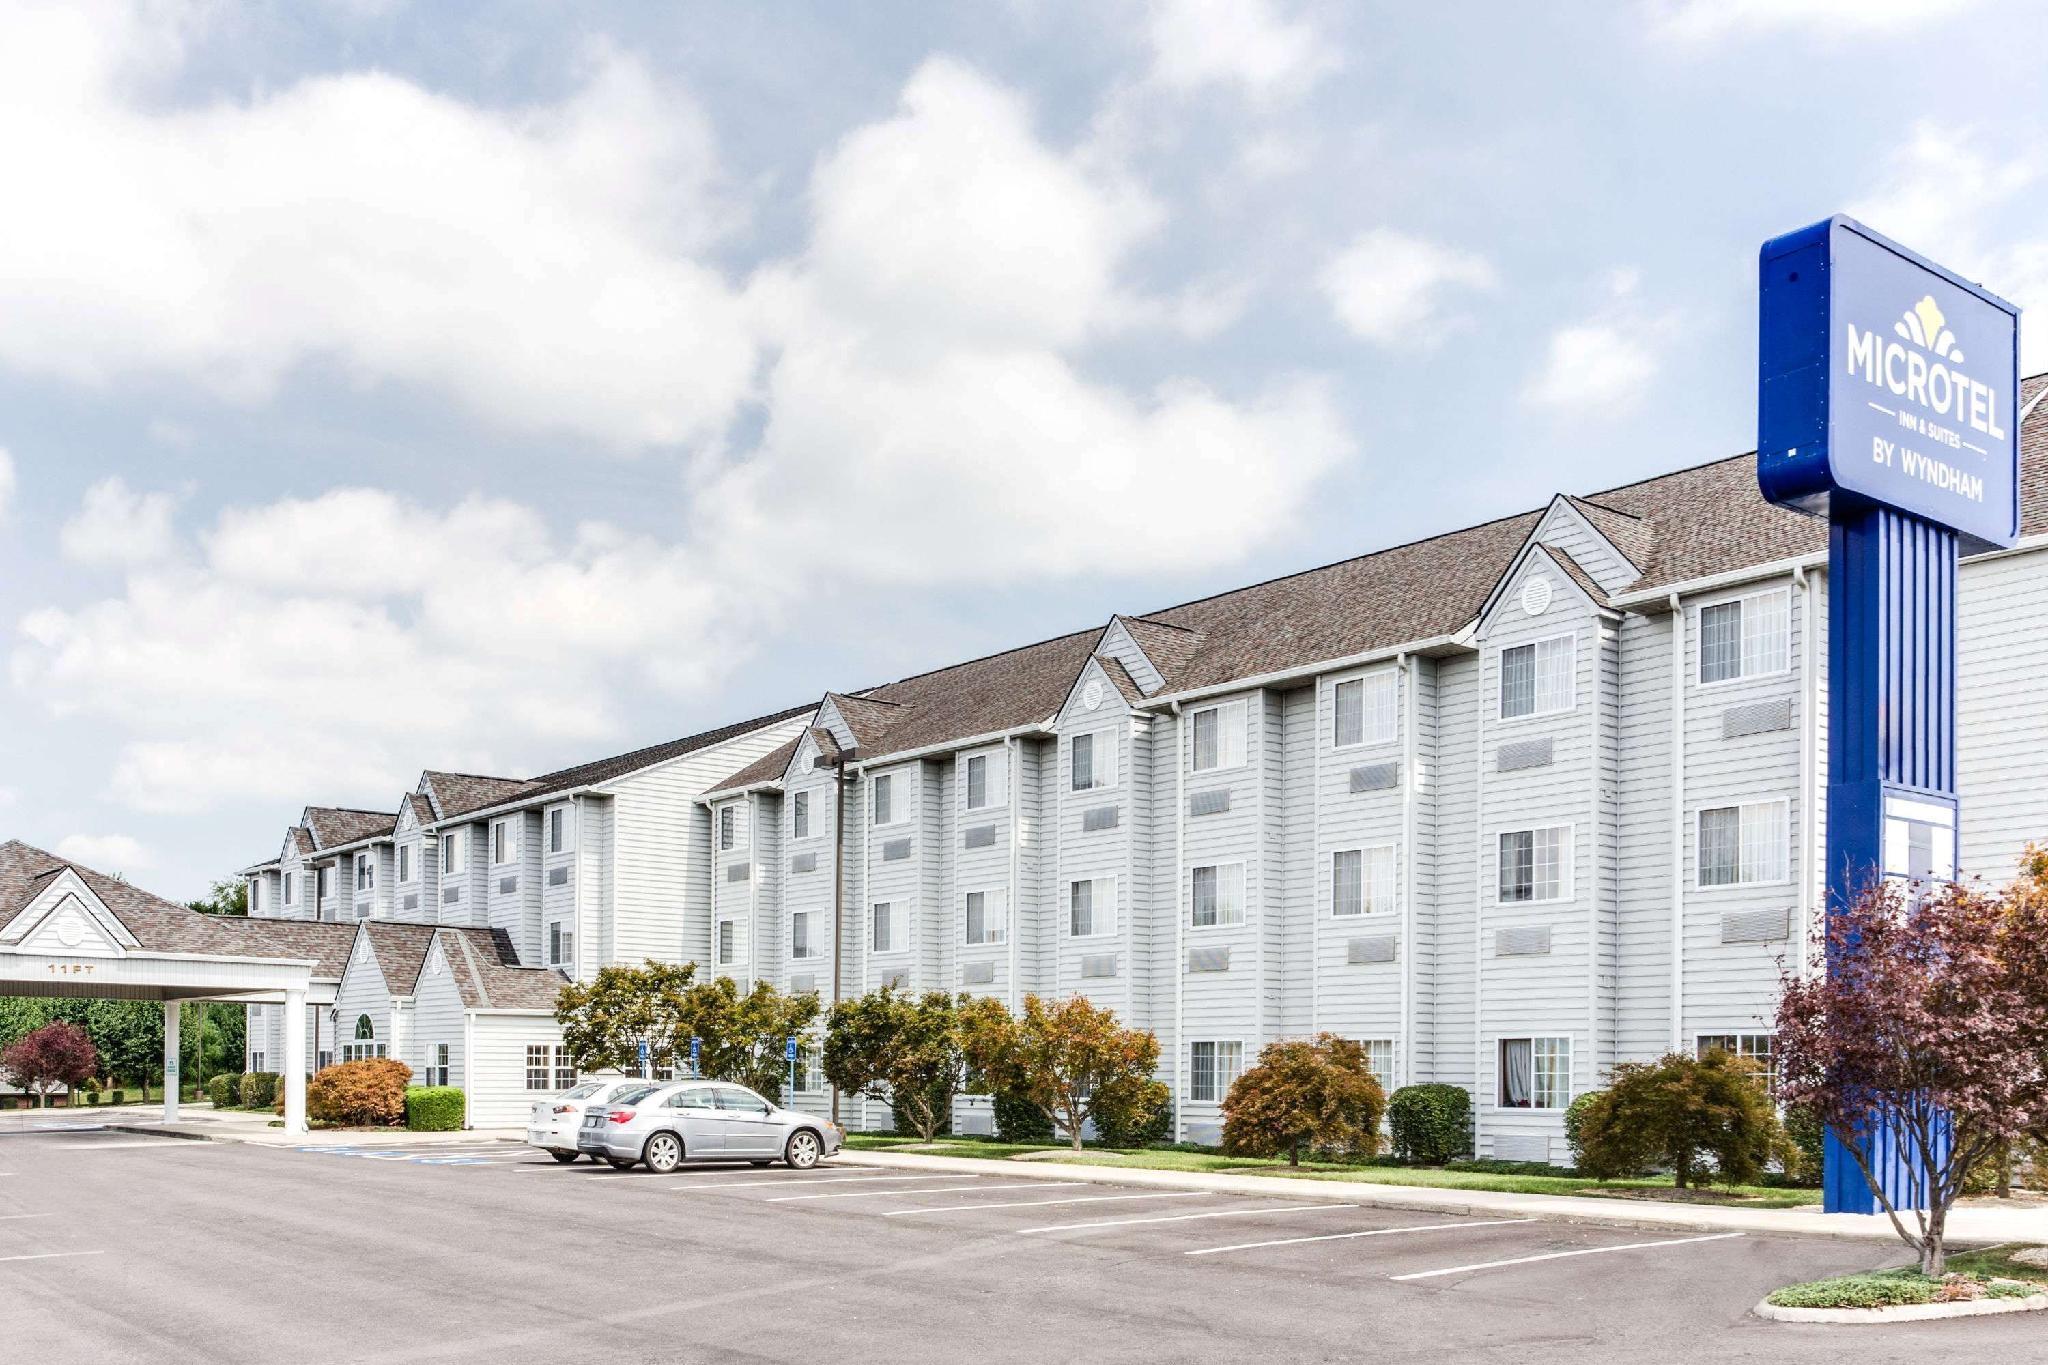 Microtel Inn And Suites By Wyndham Christiansburg Blacksburg